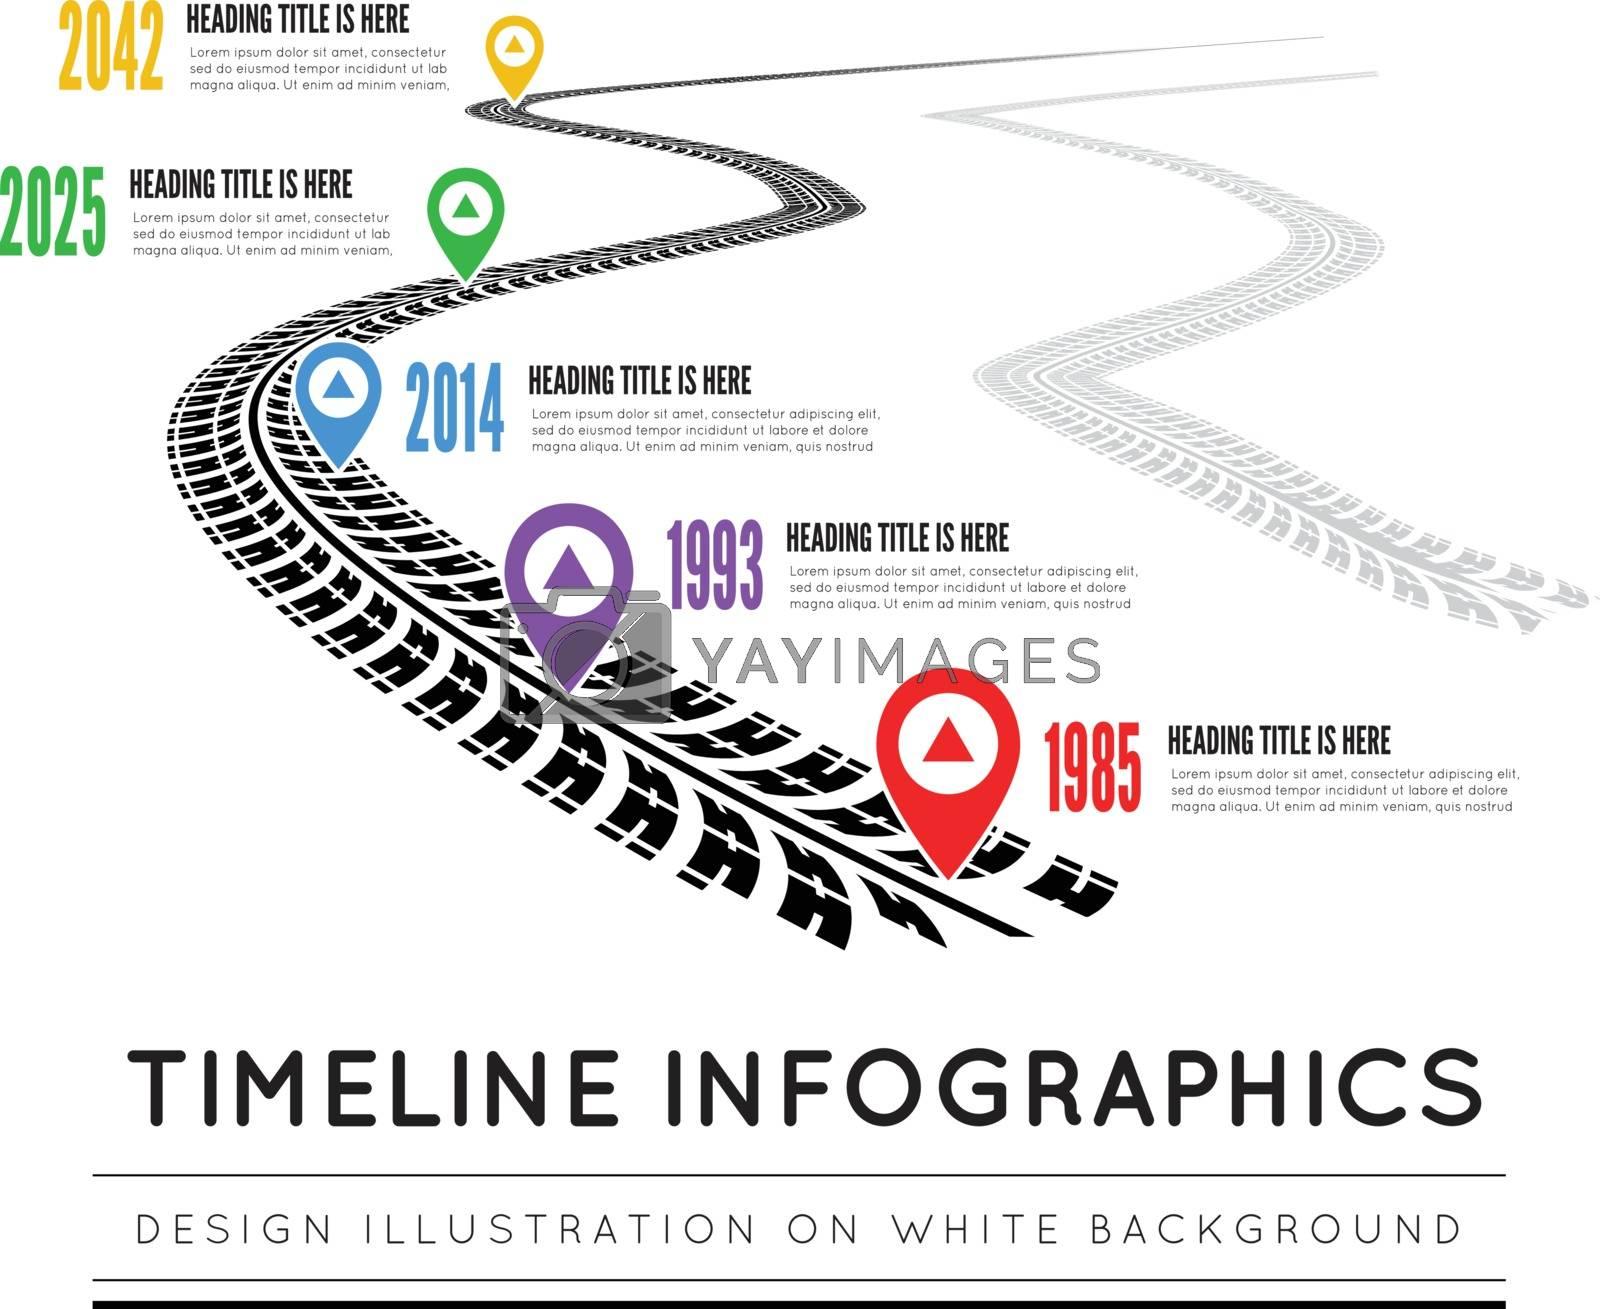 Road way design infographics. Tire tracks timeline. Vector illustration on white